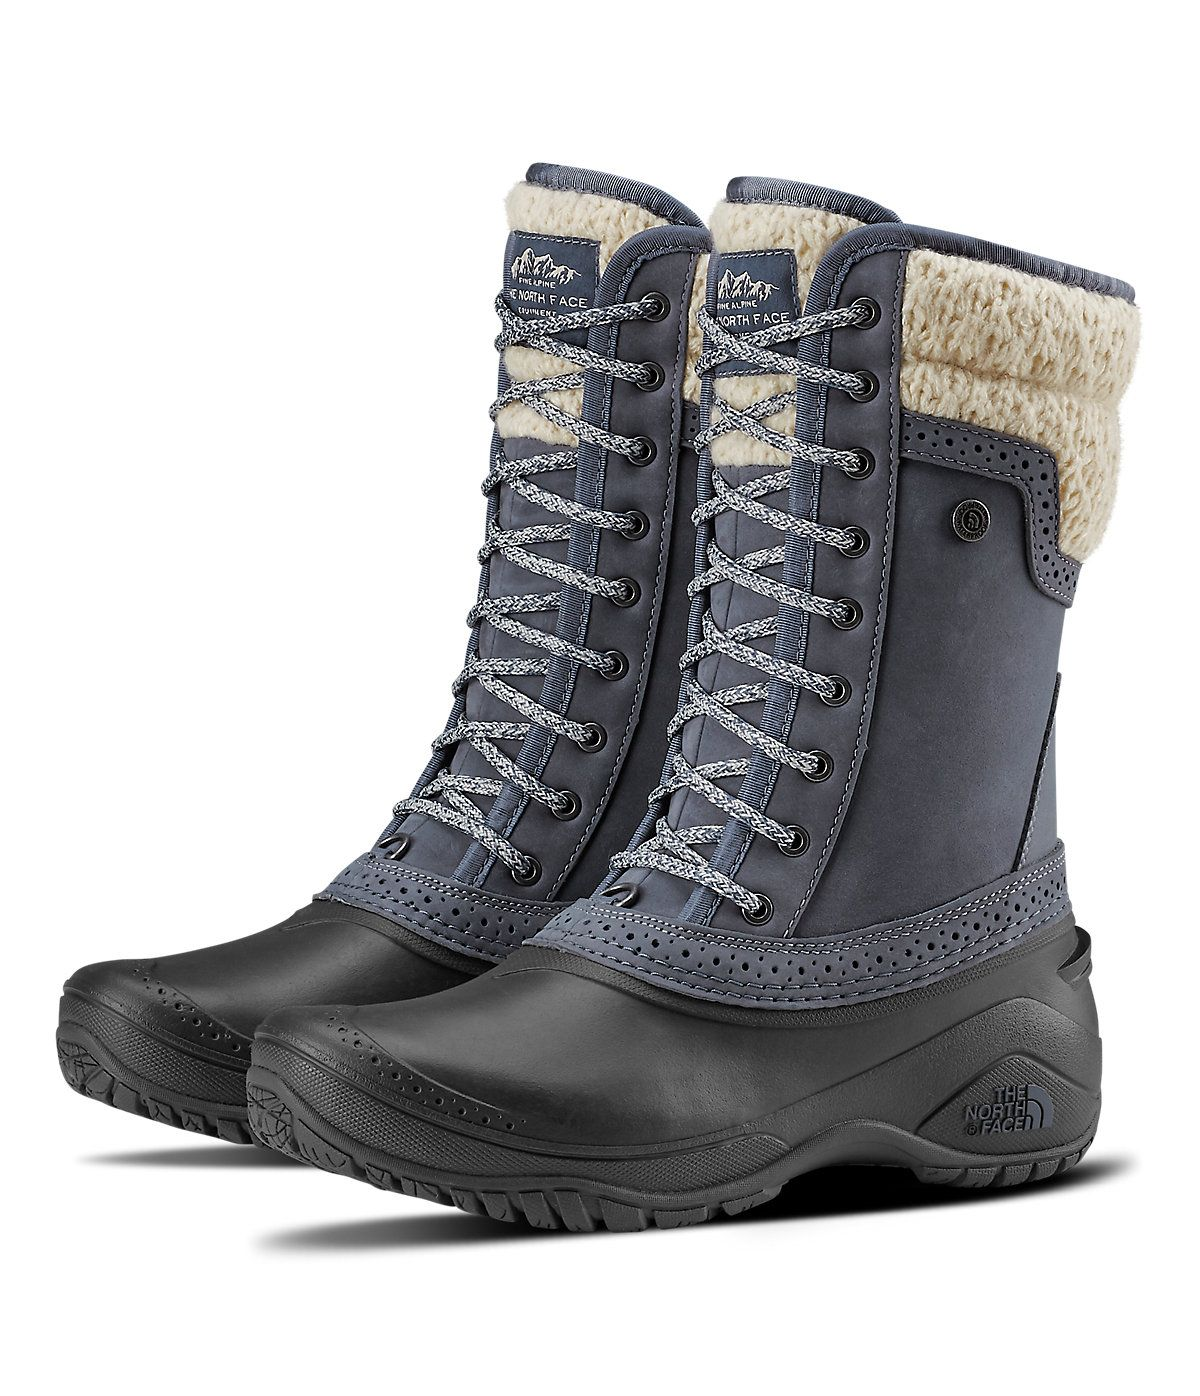 1543603f0f28 The North Face Women s Shellista II Mid Waterproof Boots